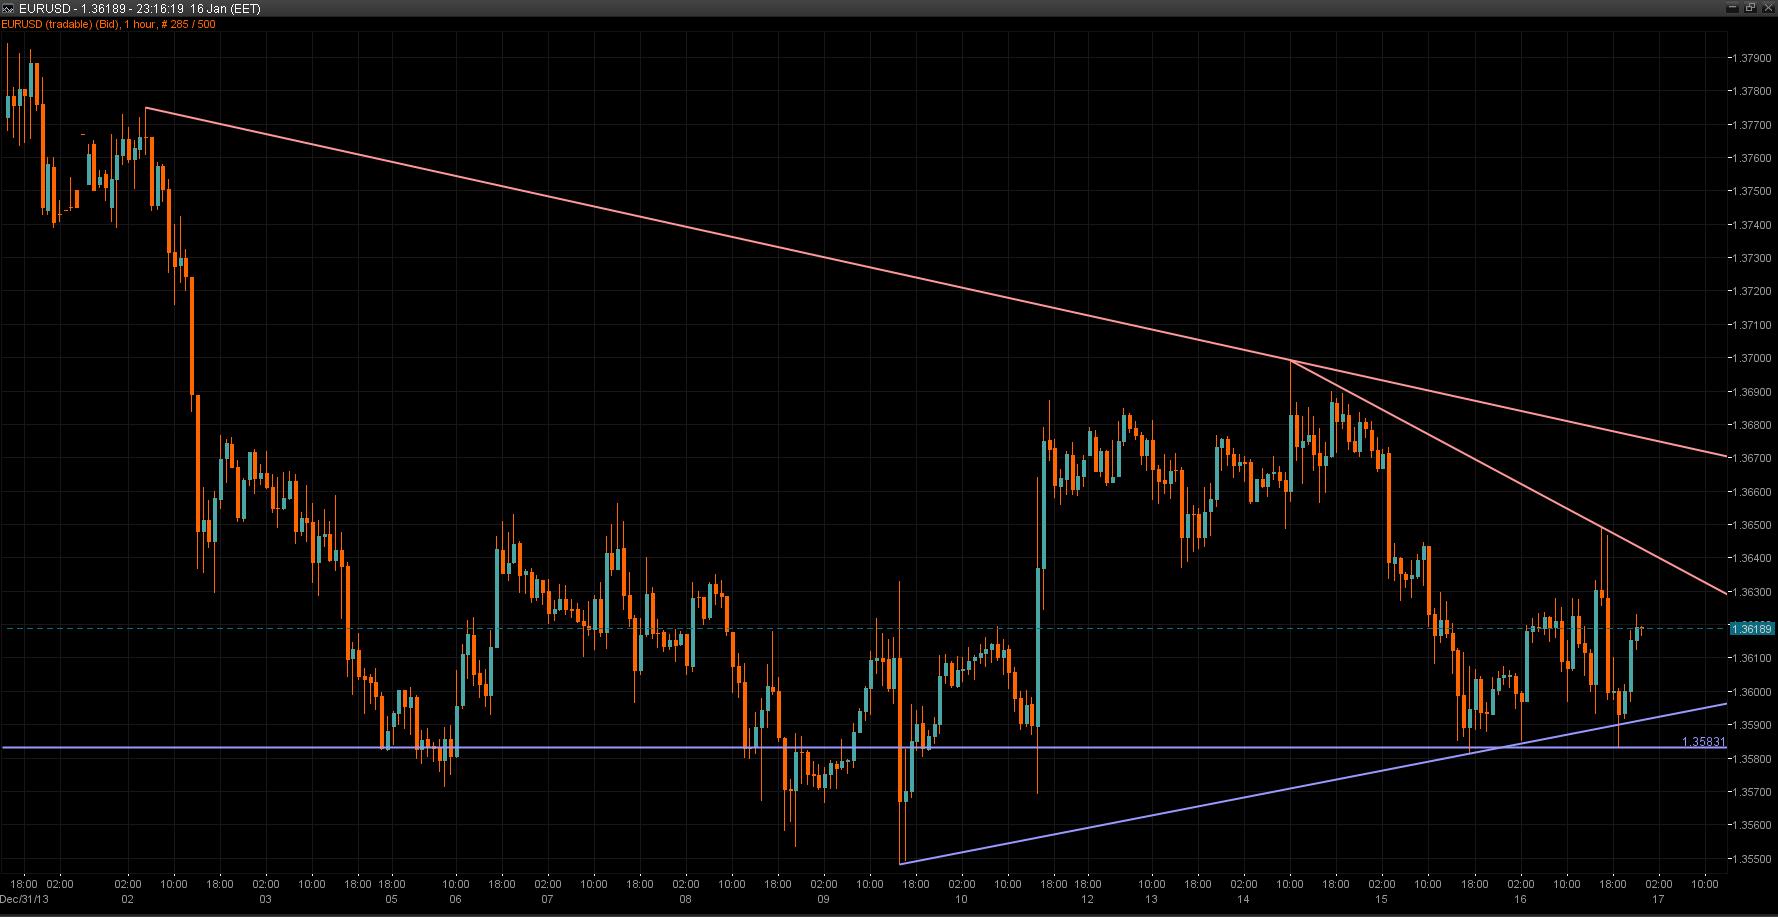 EUR/USD Chart 16 Jan 2014